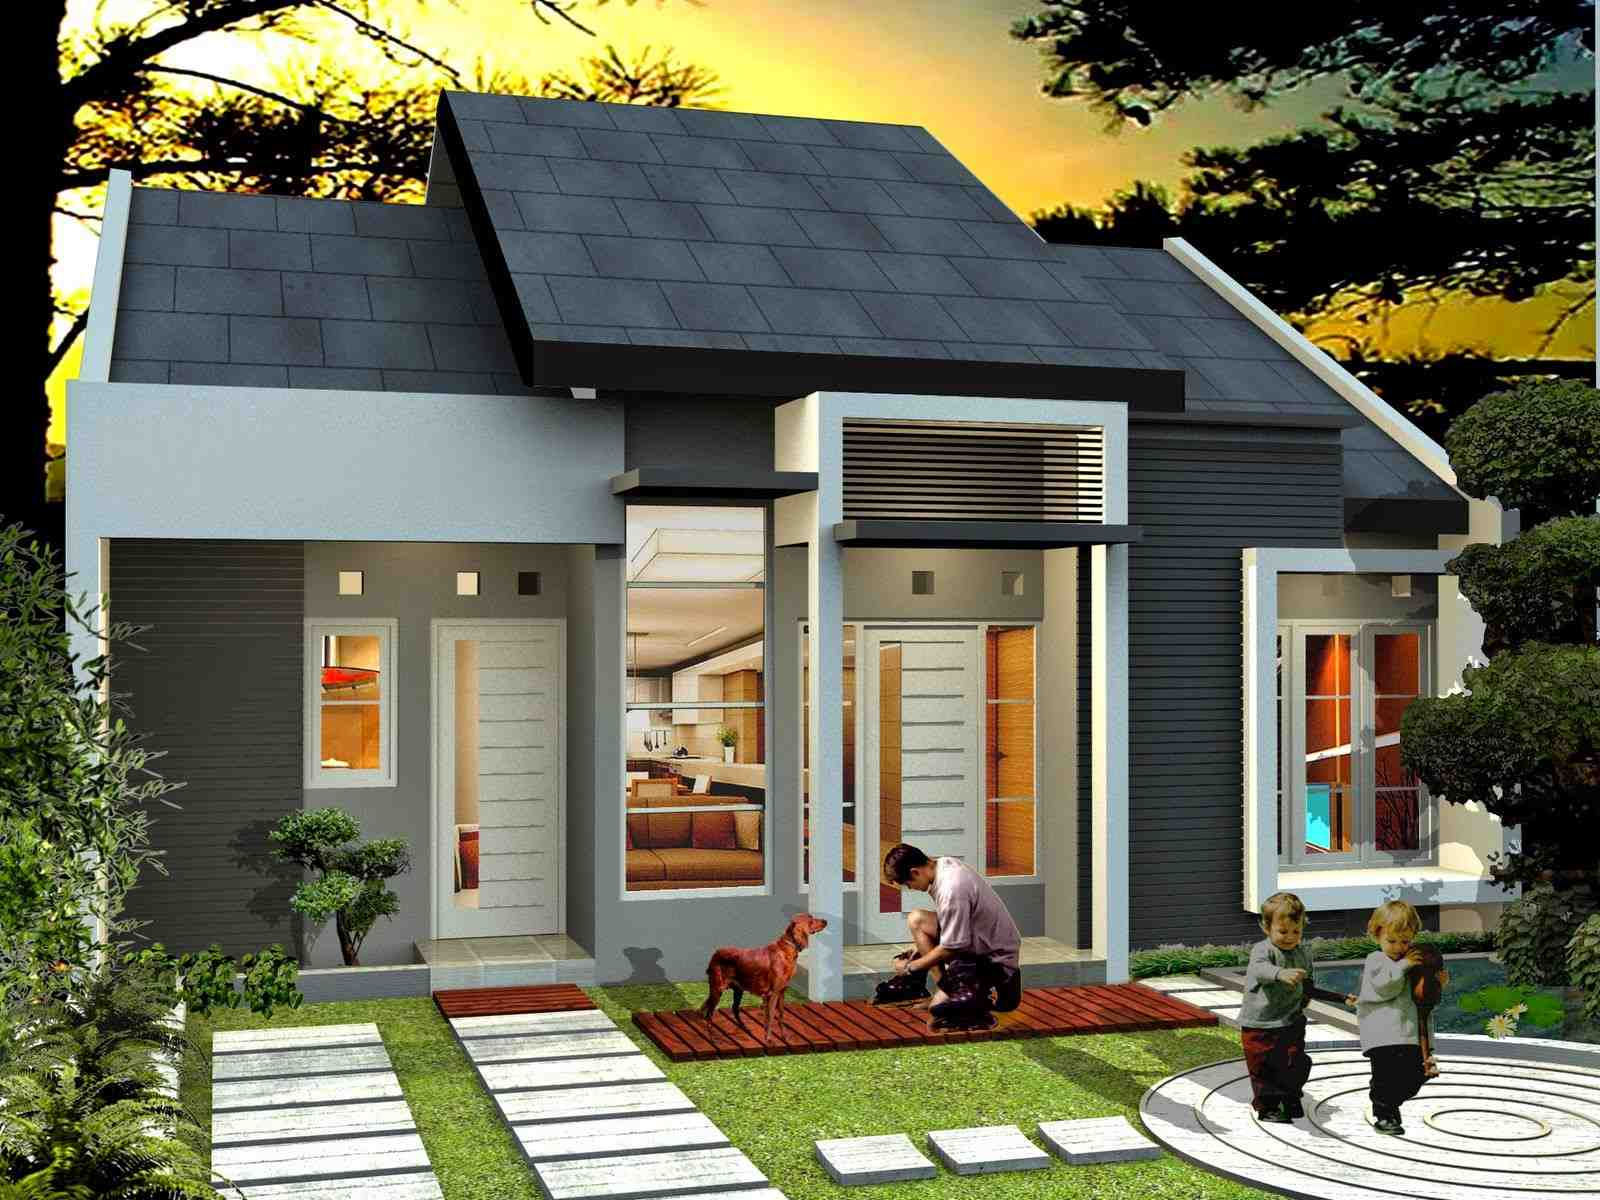 Rumah Minimalis 2 Lantai 100 Jutaan Dshdesign4K Gambar Foto